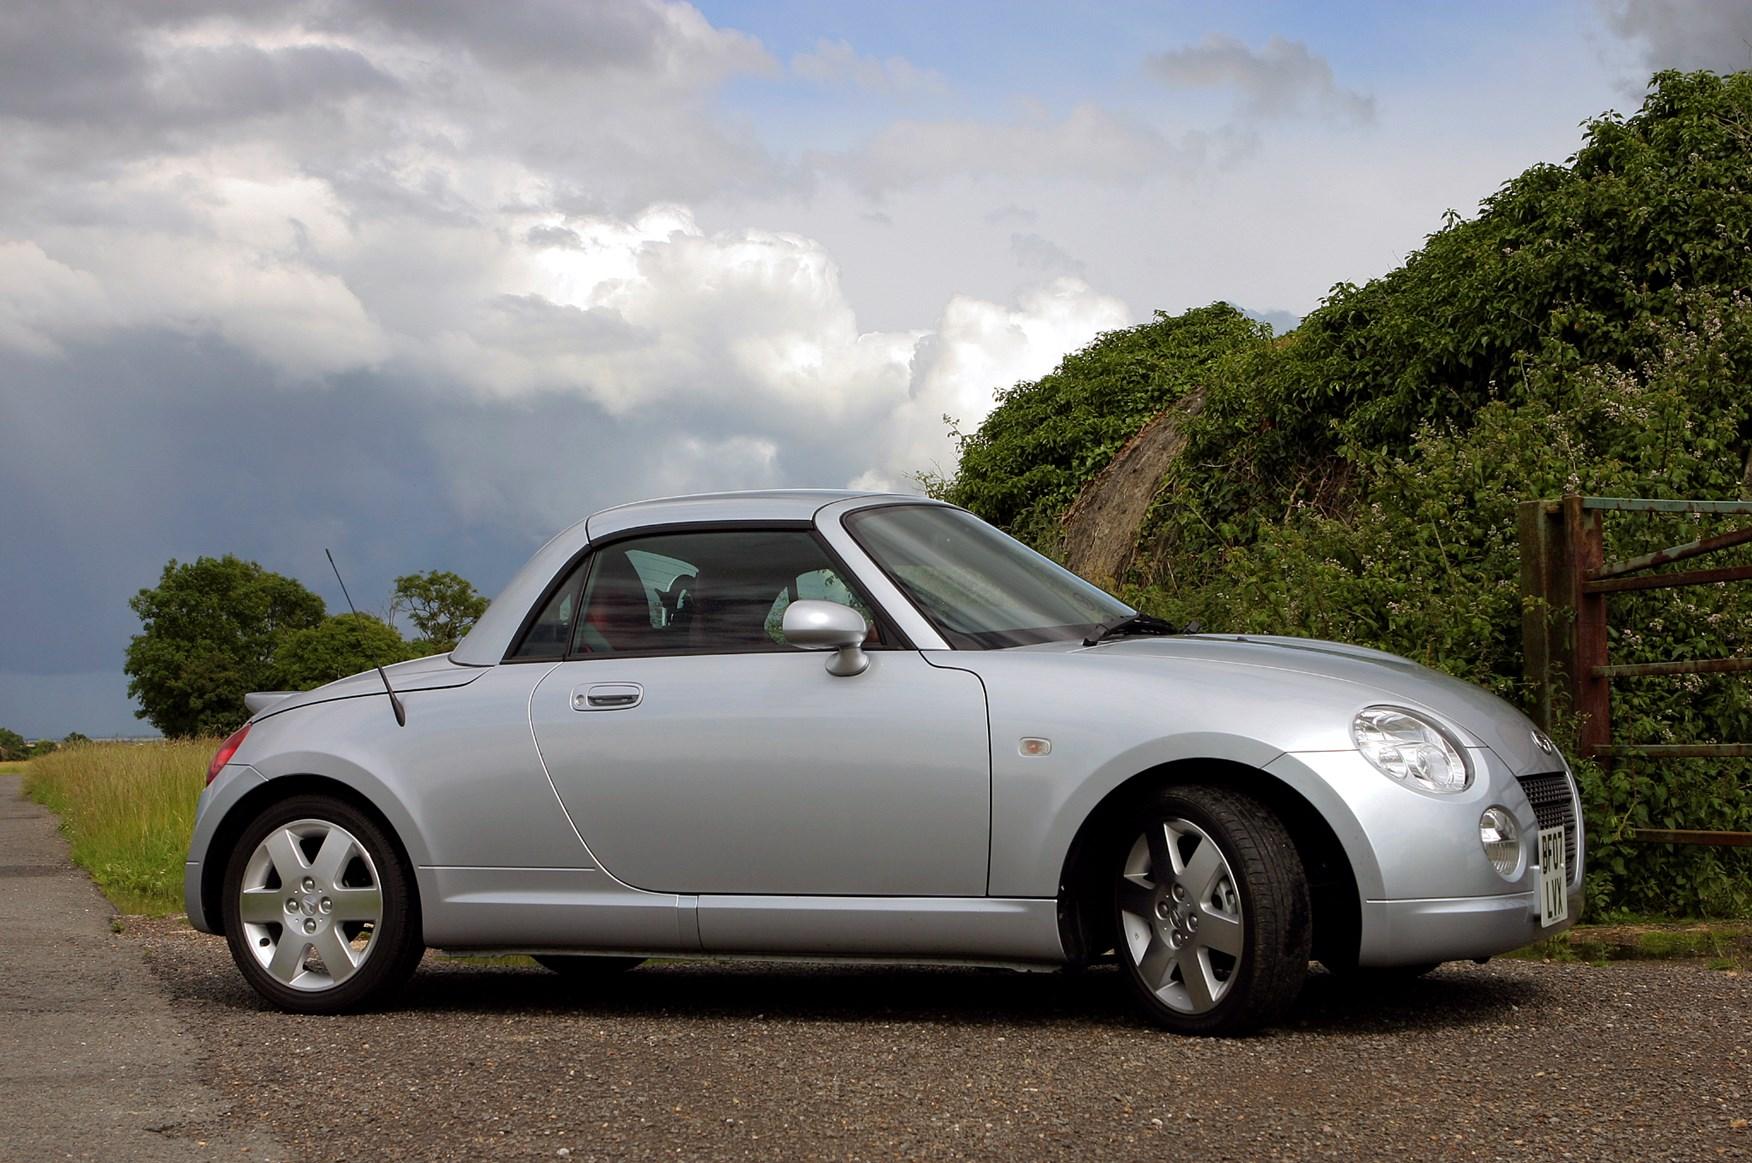 Daihatsu copen coupe cabriolet review 2004 2010 parkers